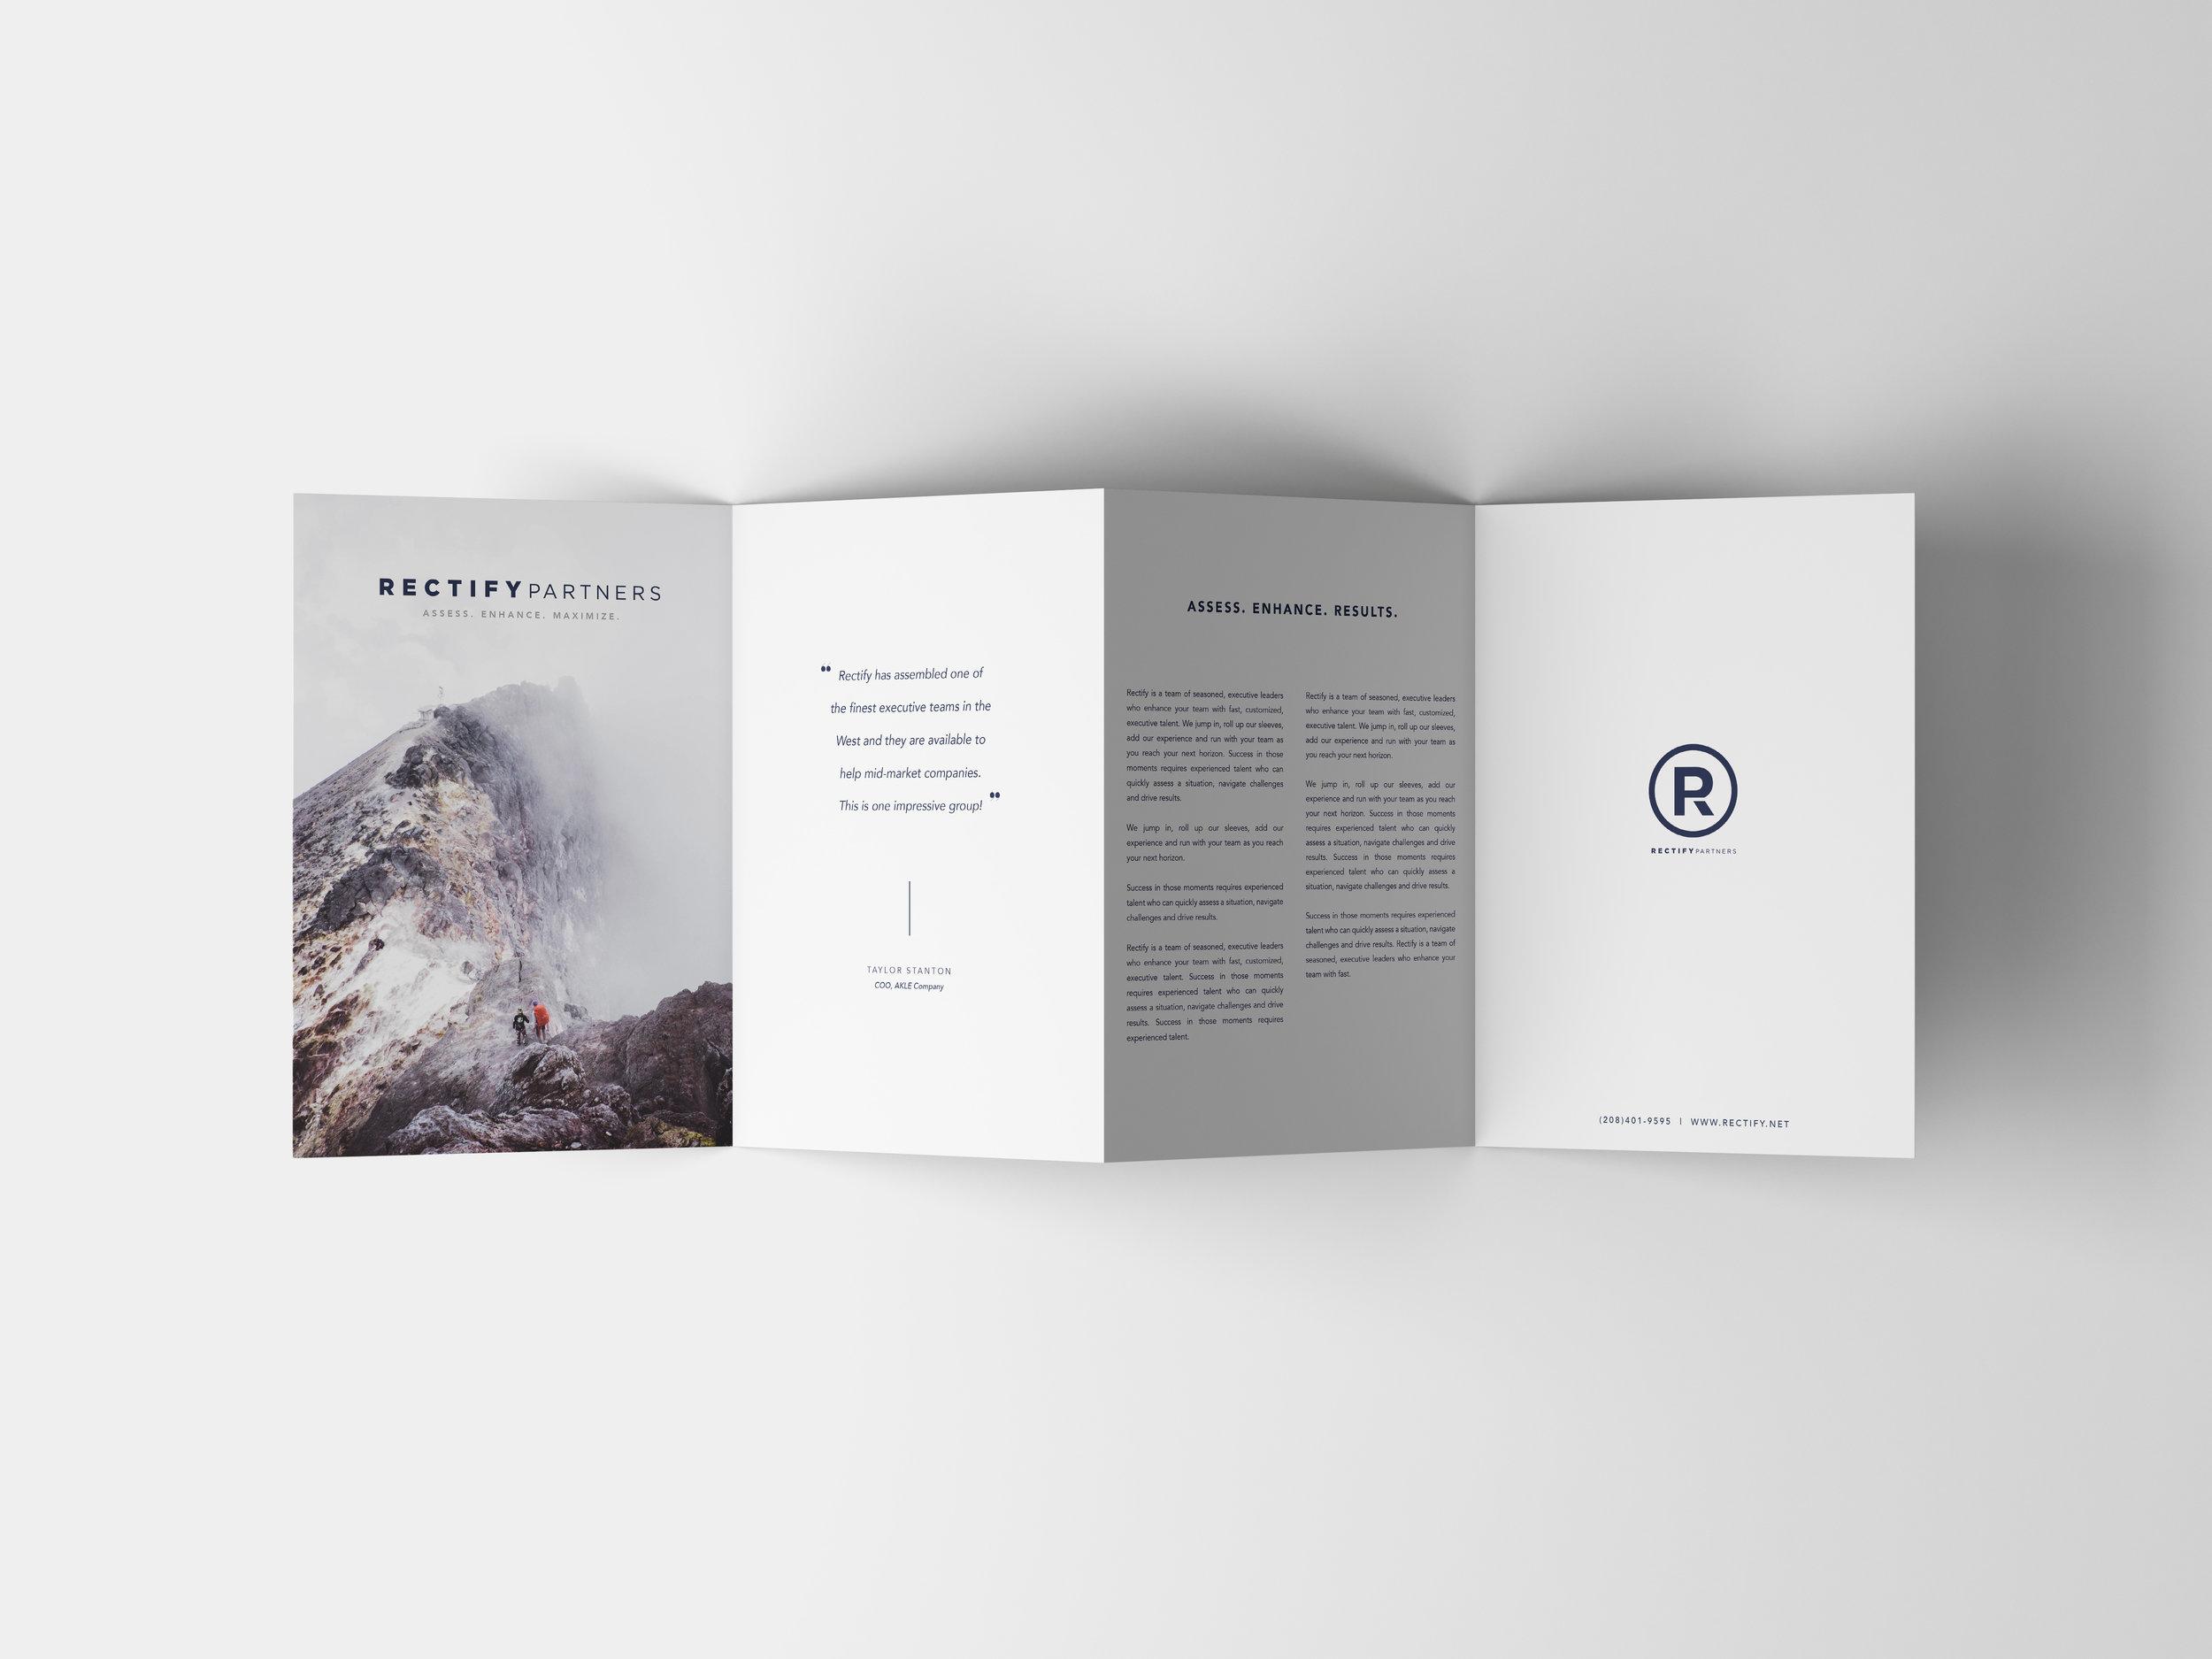 rp-brochure2 copy.jpg